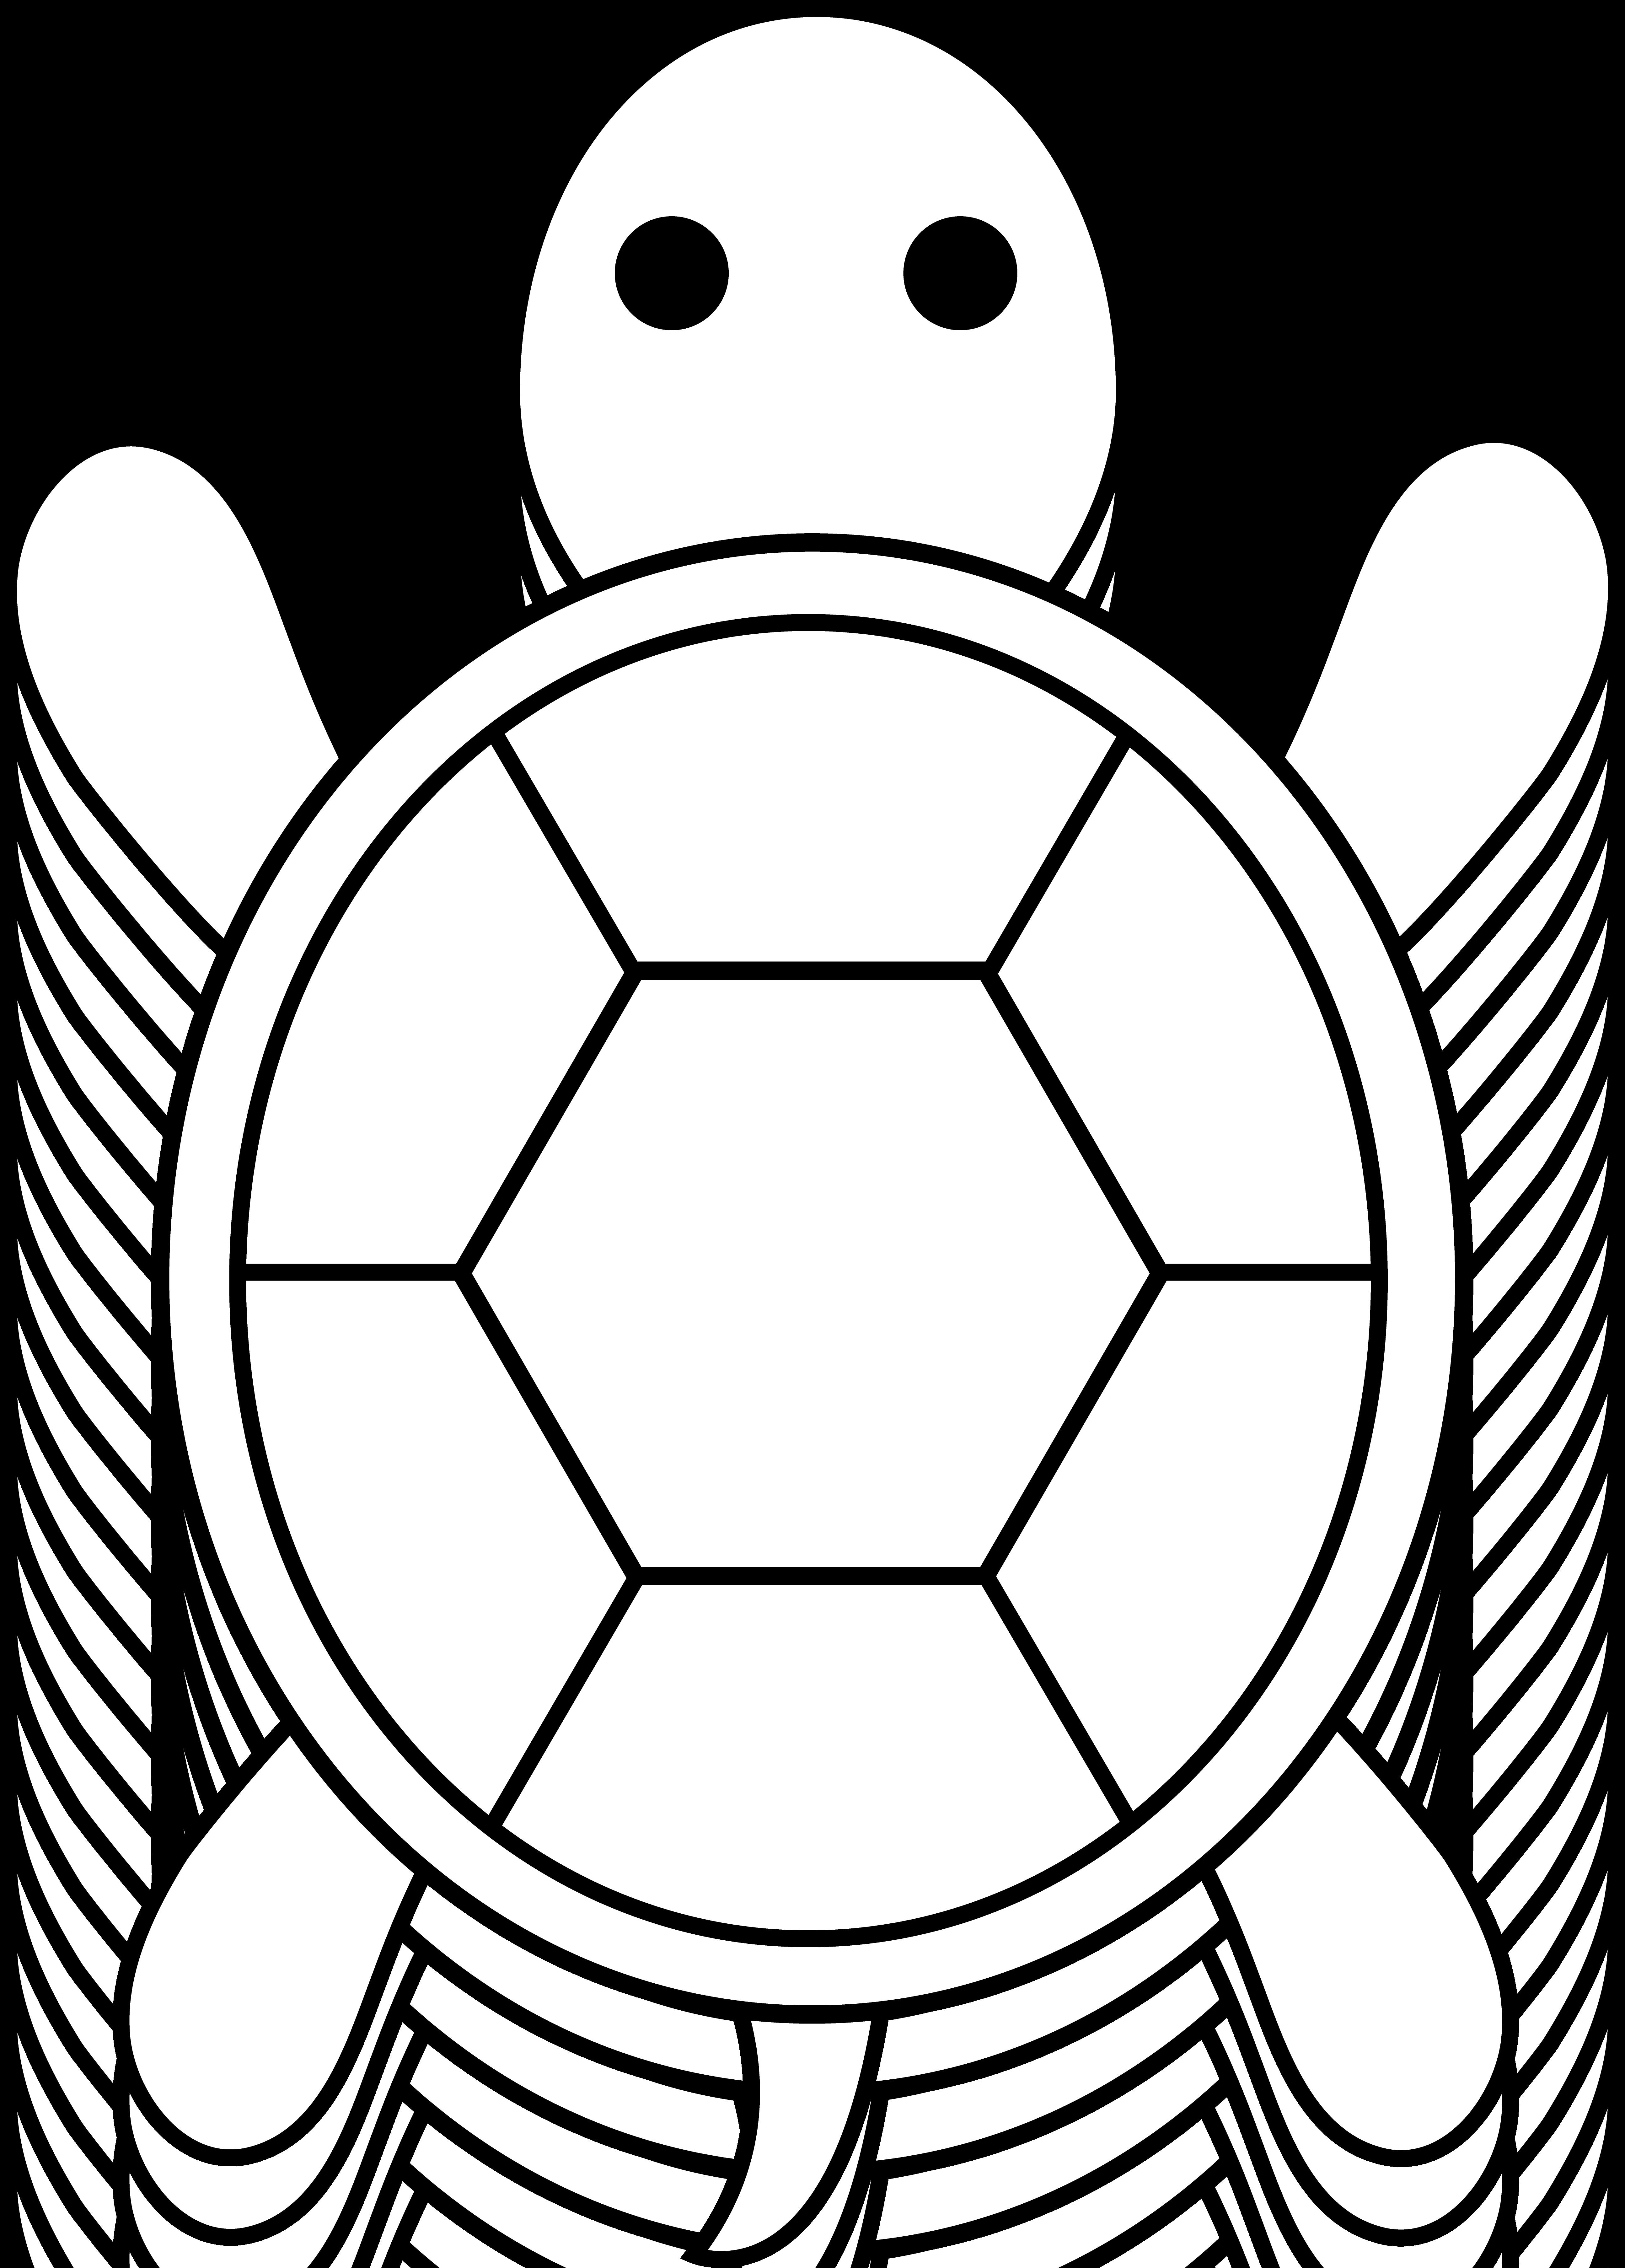 turtle coloring book ninja turtles coloring pages learn to coloring book coloring turtle